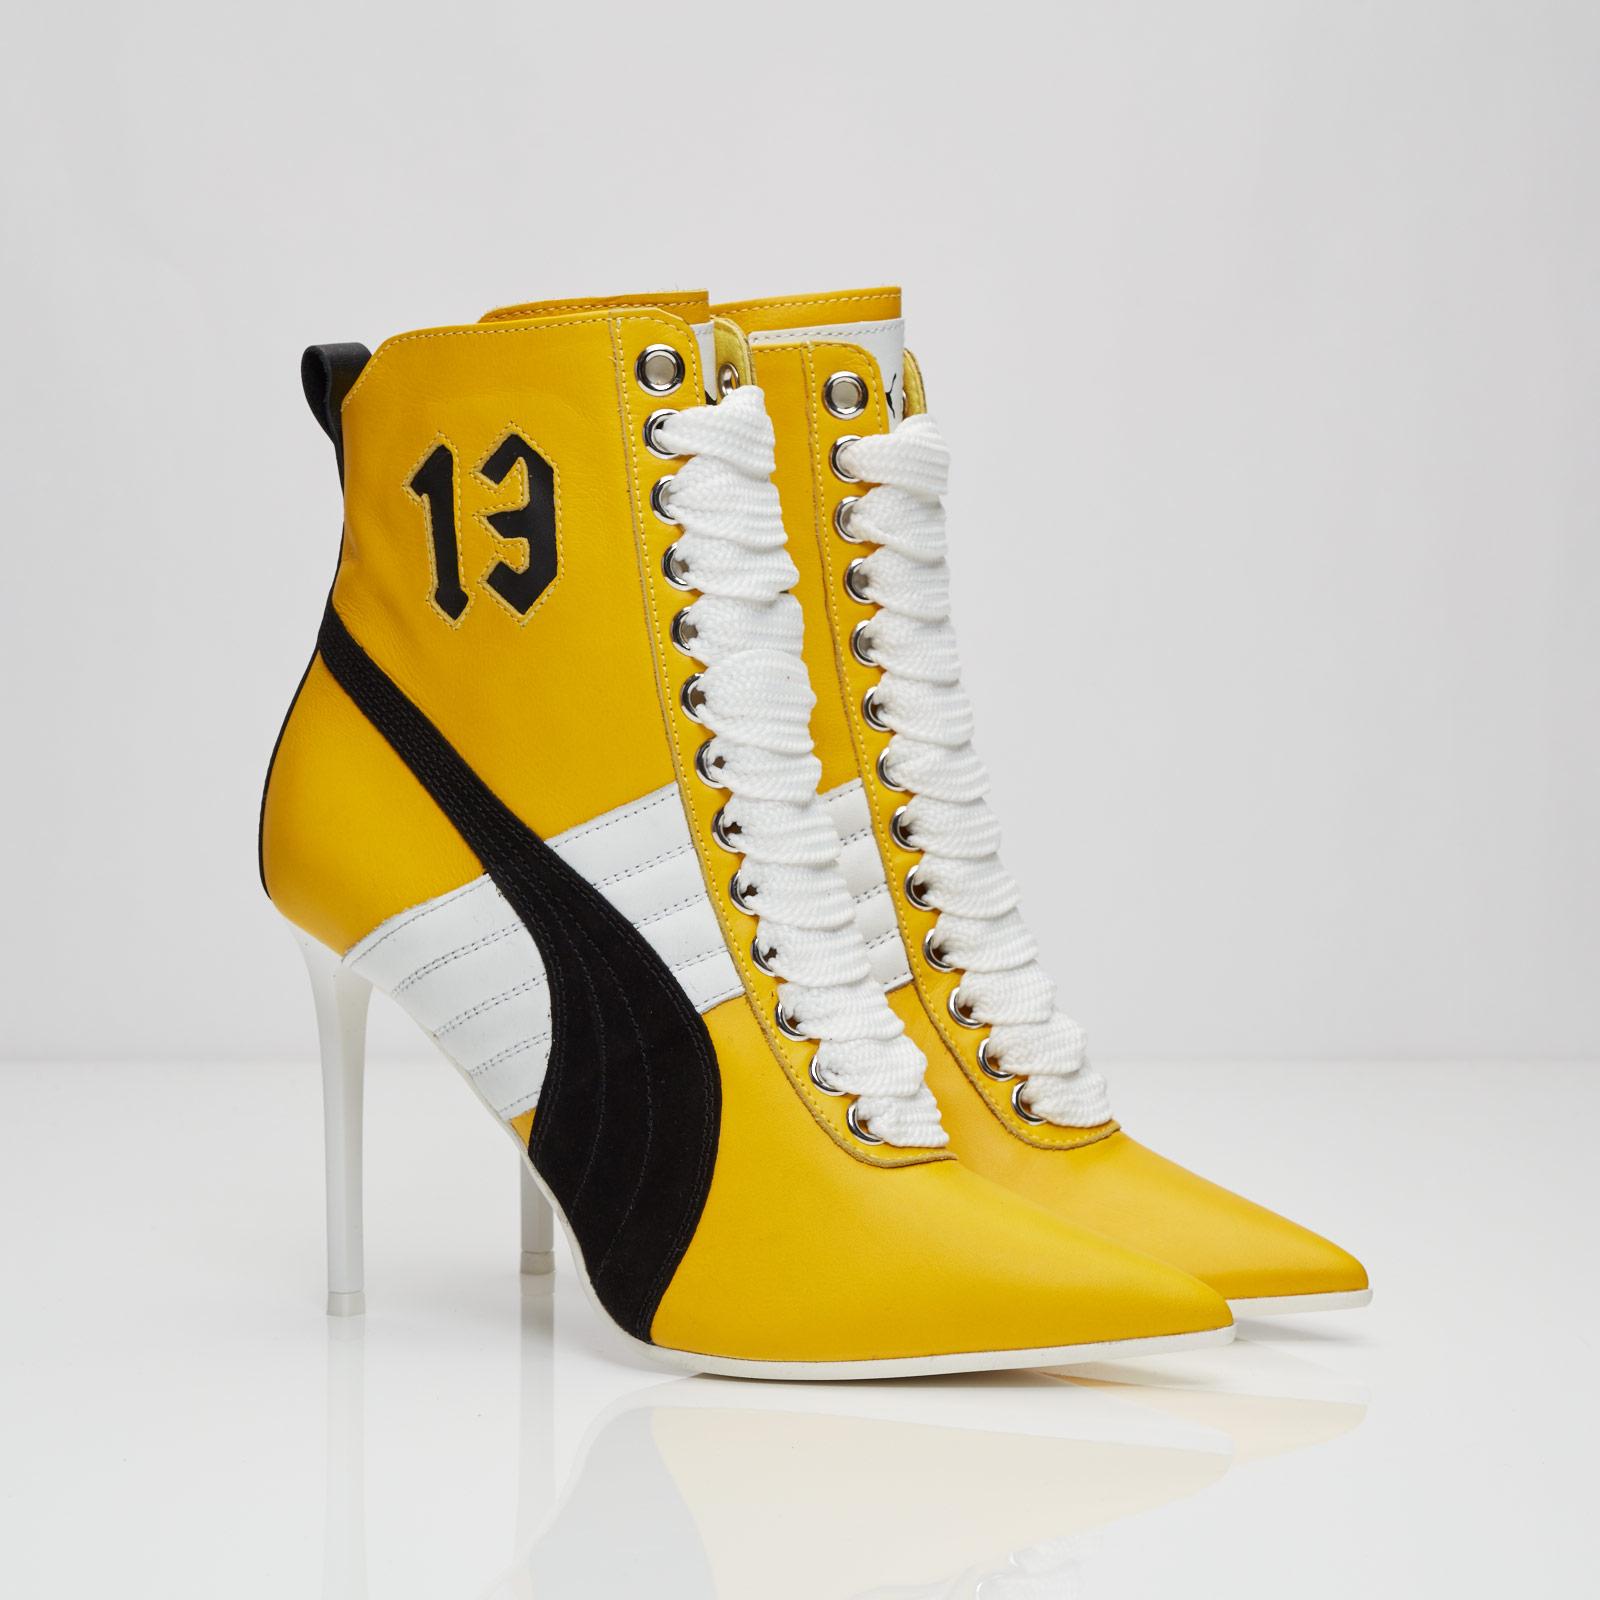 High Heel Leather Rihanna PUMA ENPRAAquEB